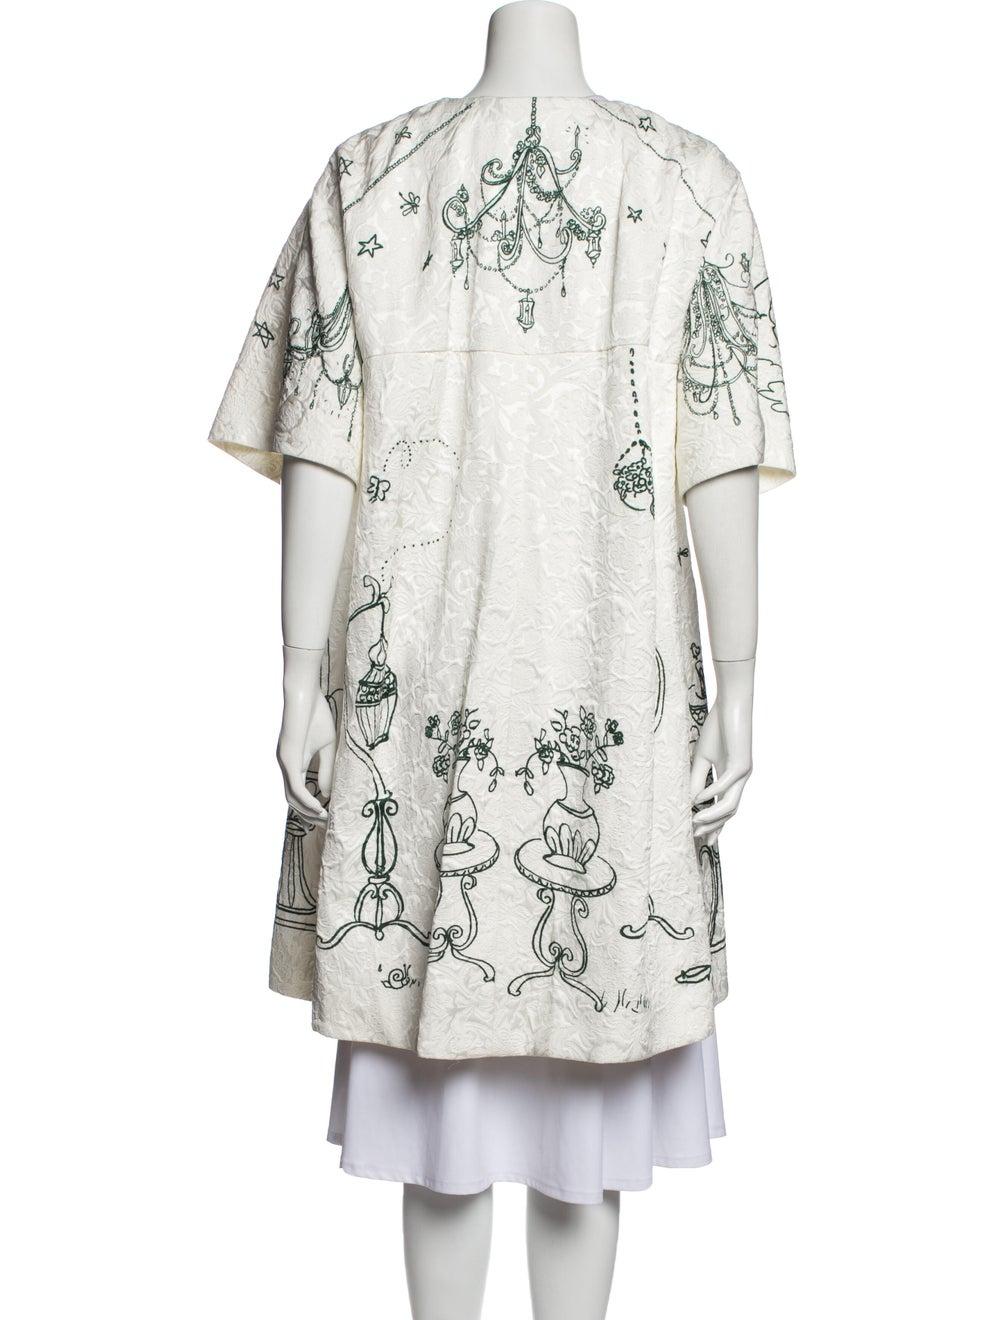 Dolce & Gabbana Printed Coat White - image 3